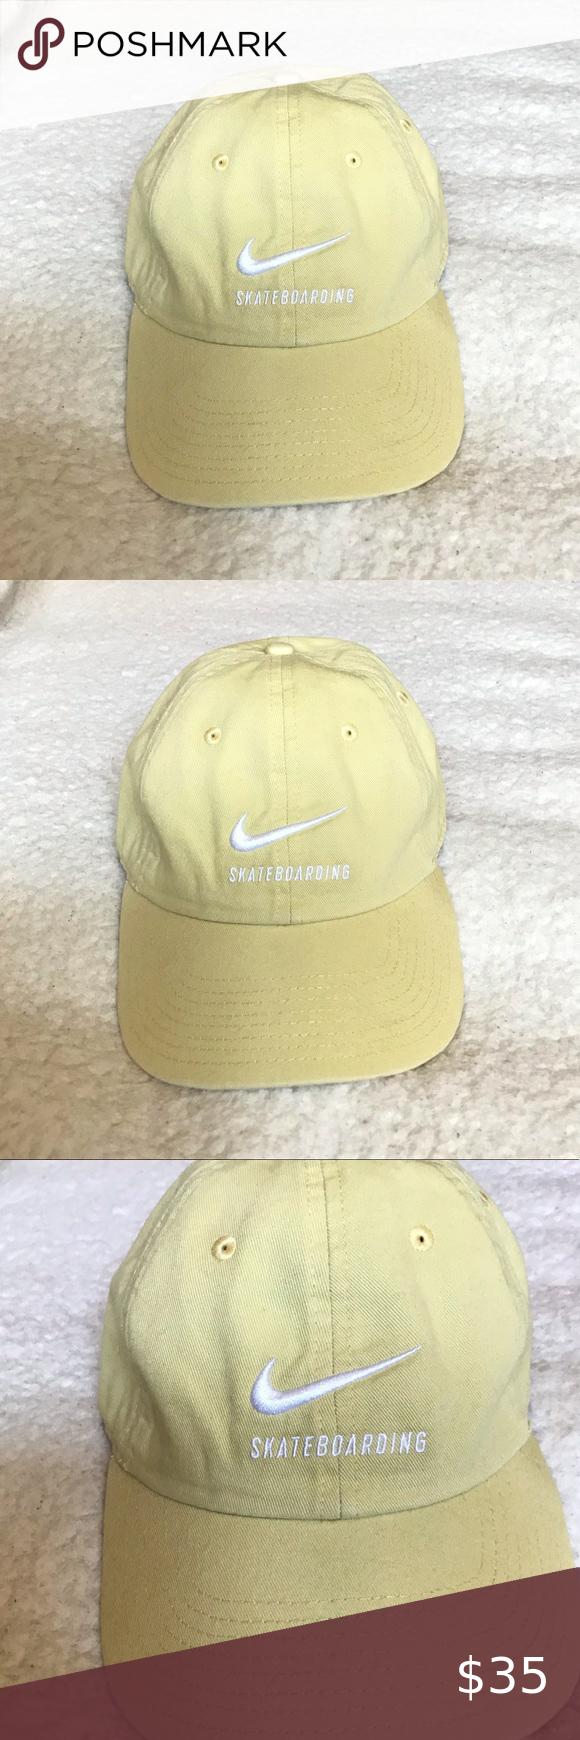 Nike Sb Heritage86 Skateboarding Hat Nike Sb Nike Accessories Women Accessories Hats